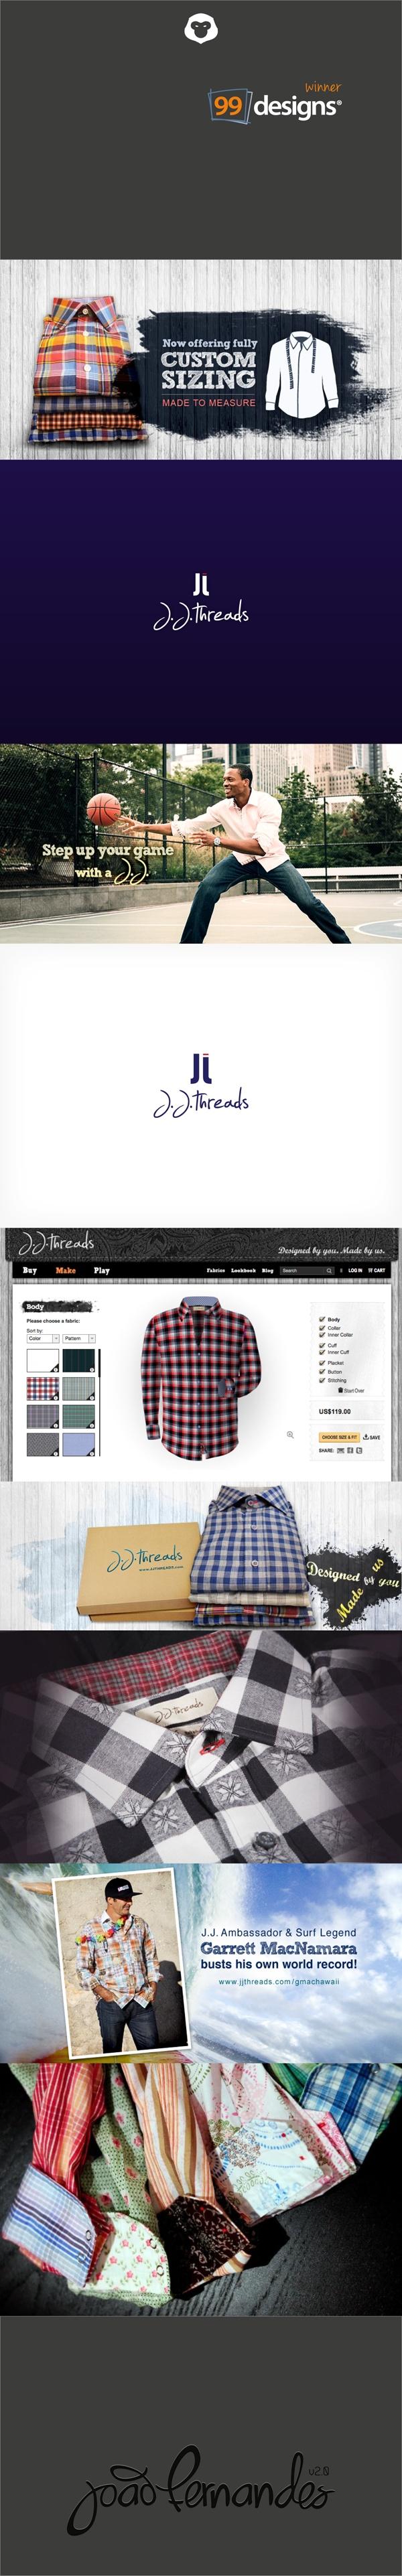 J.J. Threads | Customize your shirt by João Fernandes, via Behance @J.J. Threads